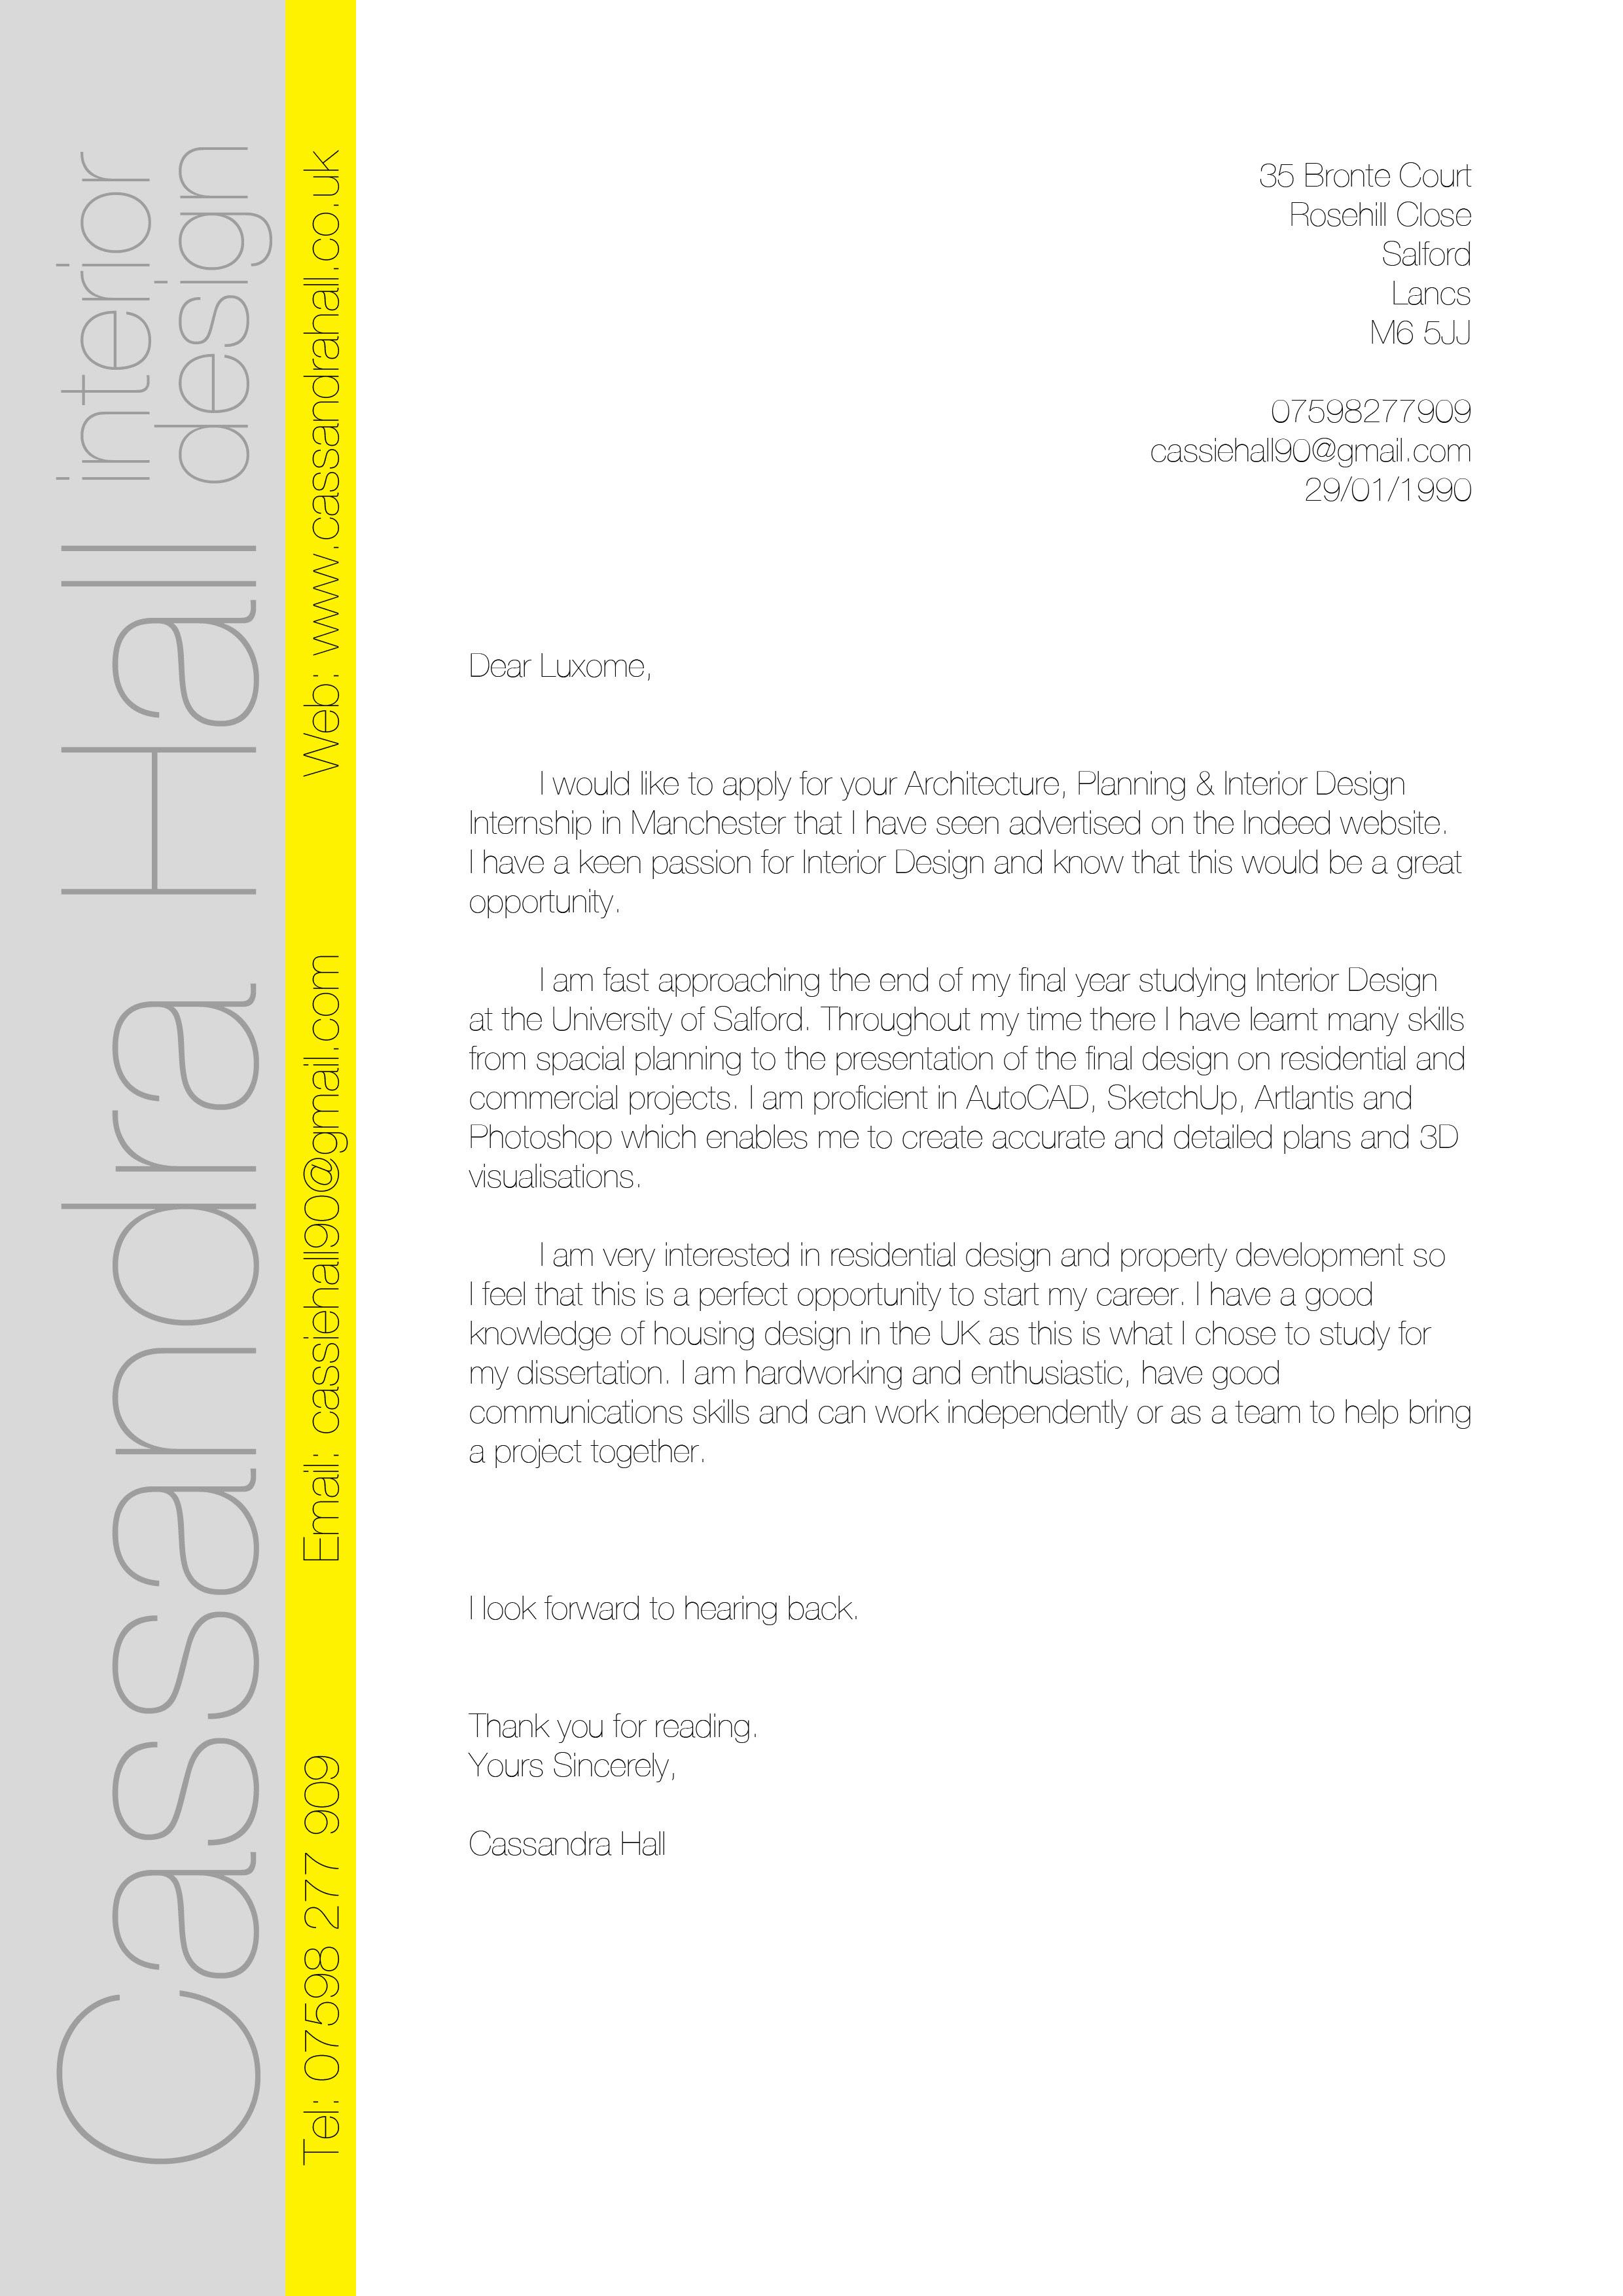 Interior Design Internship Cover Letter Examples - 200 ...